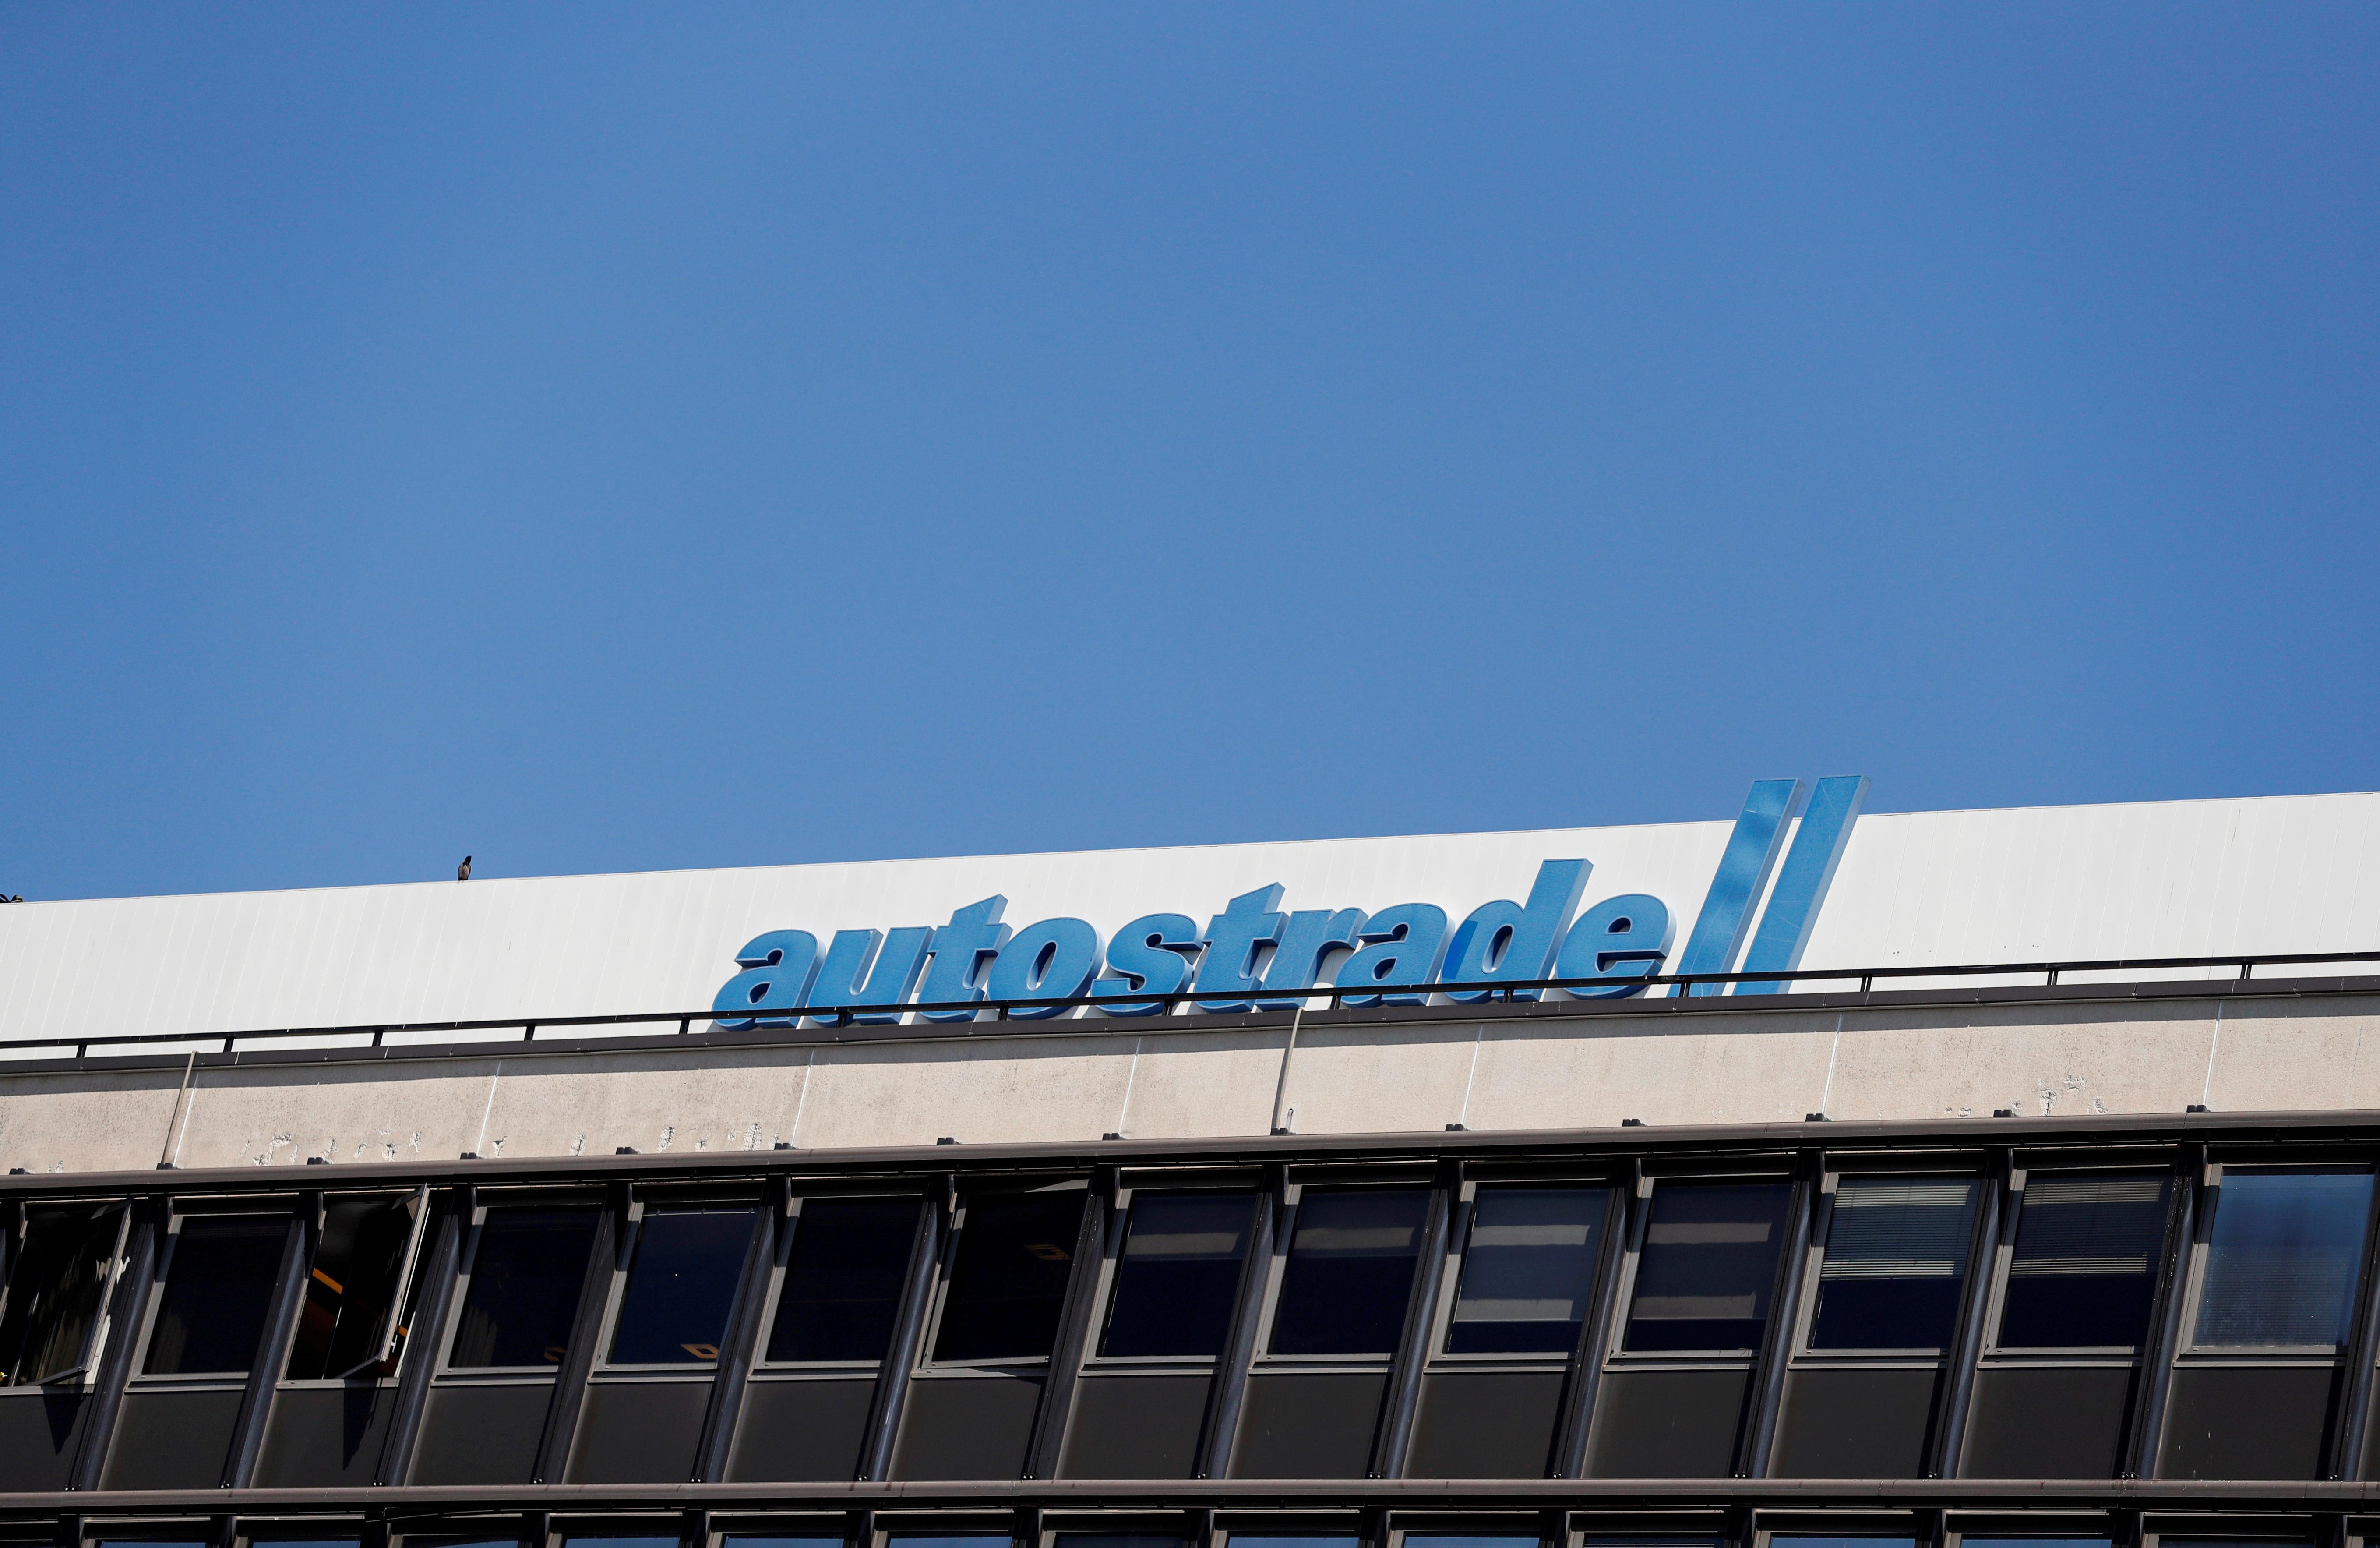 A view of the Autostrade per l'Italia headquarters in Rome, Italy, July 21, 2020. REUTERS/Yara Nardi/File Photo/File Photo